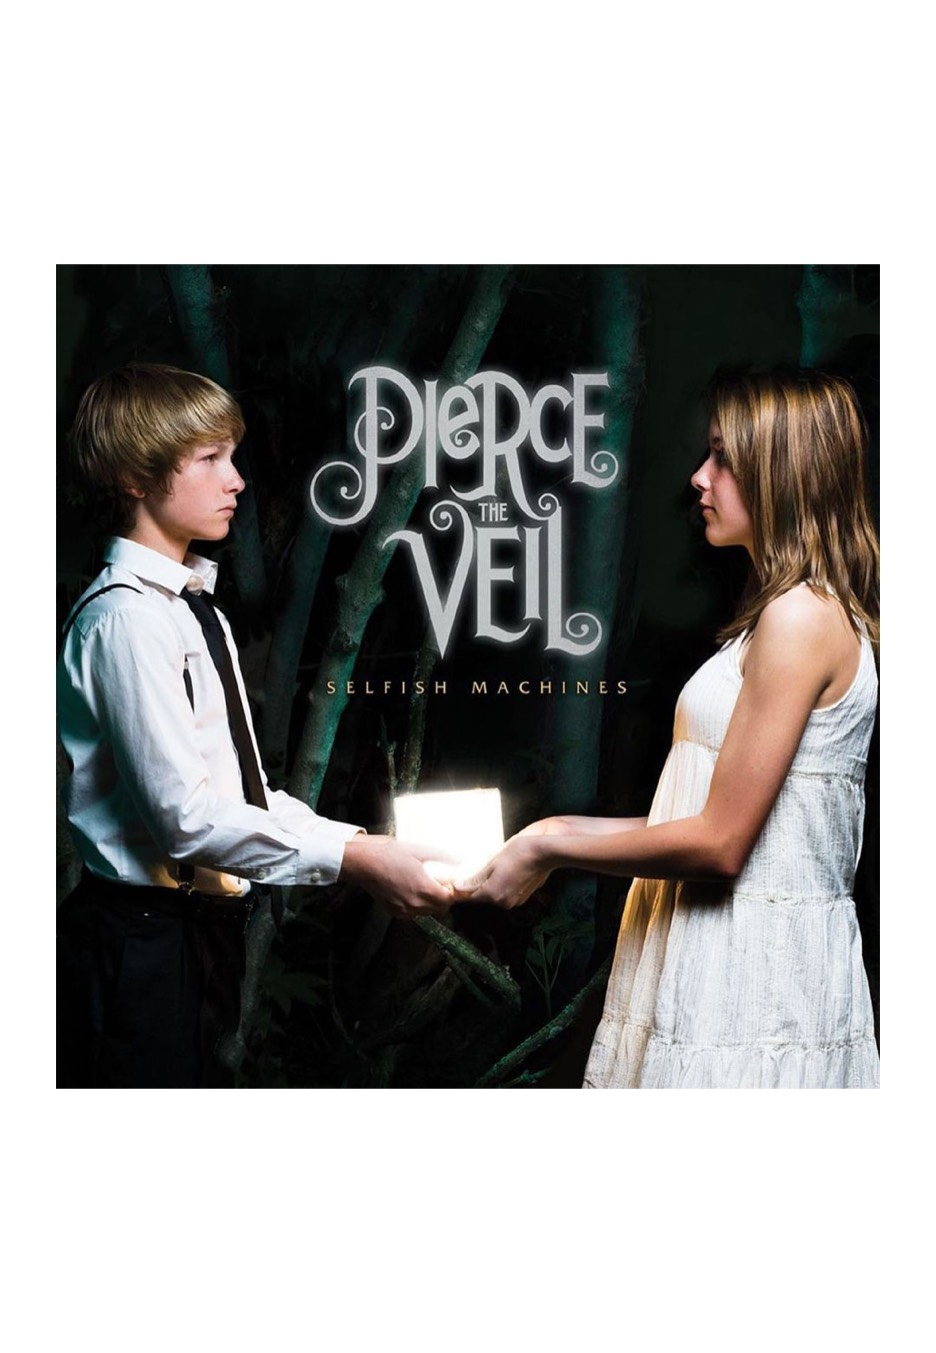 pierce the veil selfish machines cd cds vinyl and